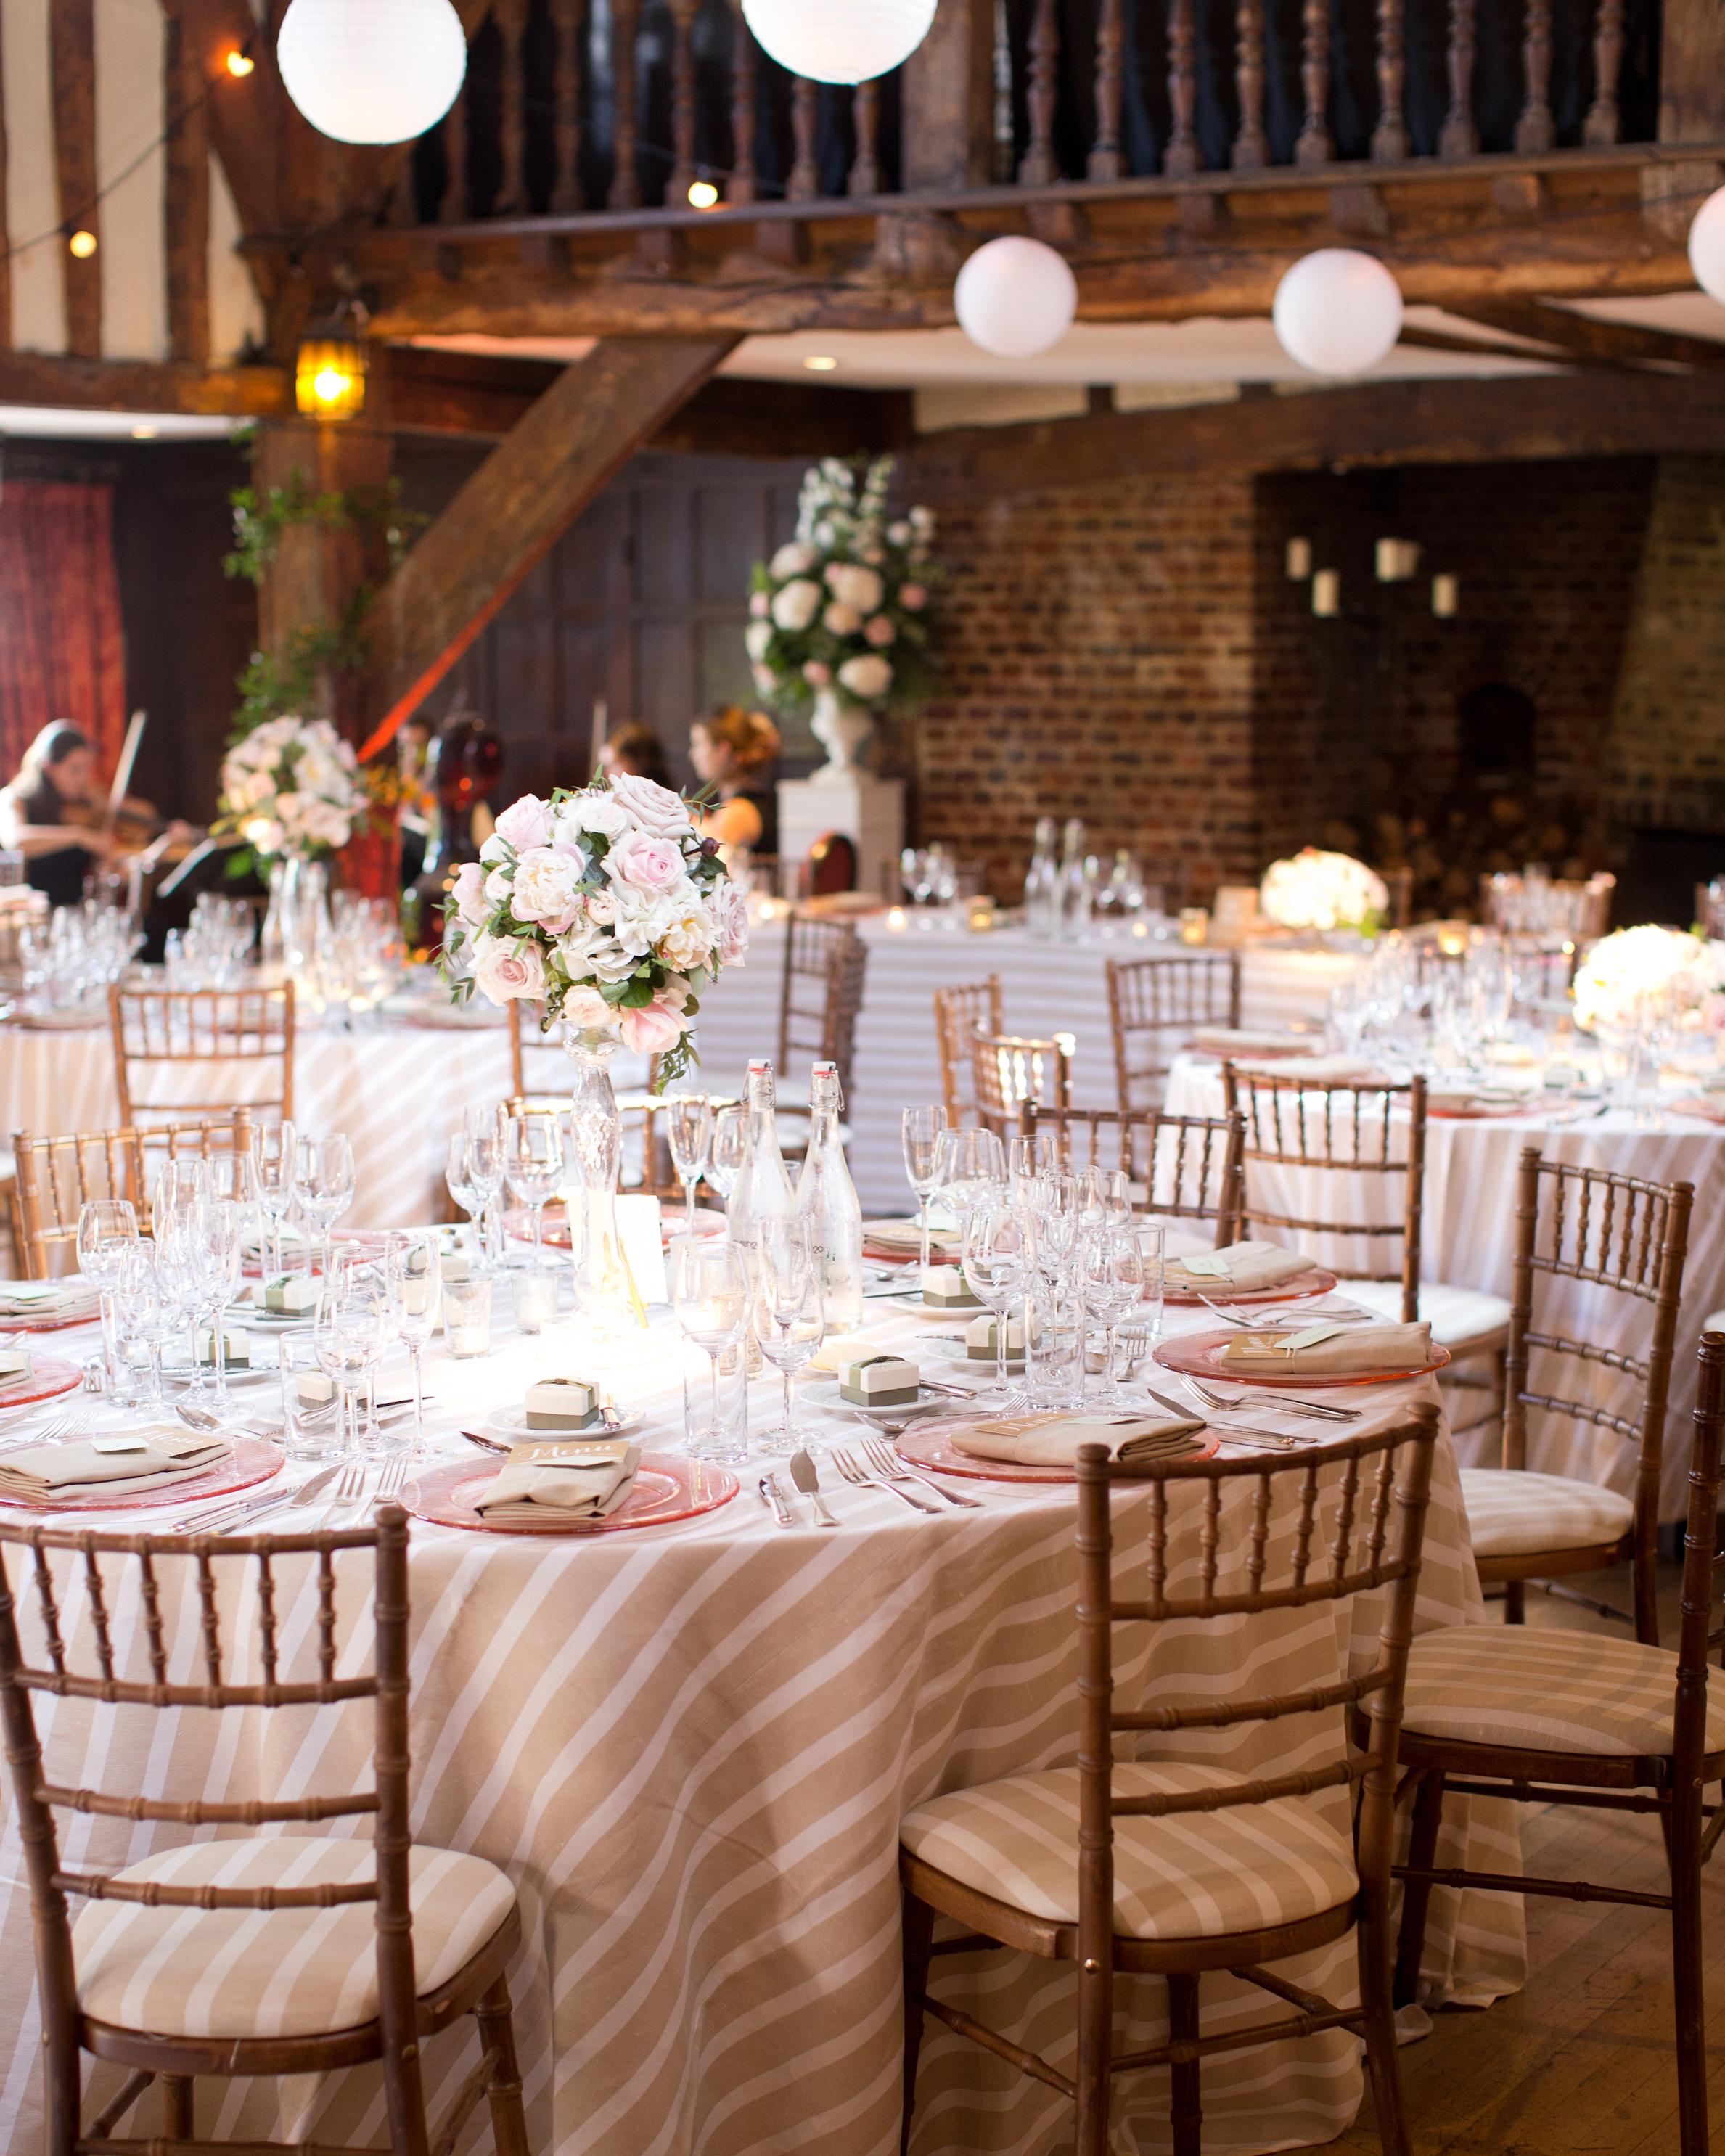 hayley-andrew-wedding-tables-0714.jpg